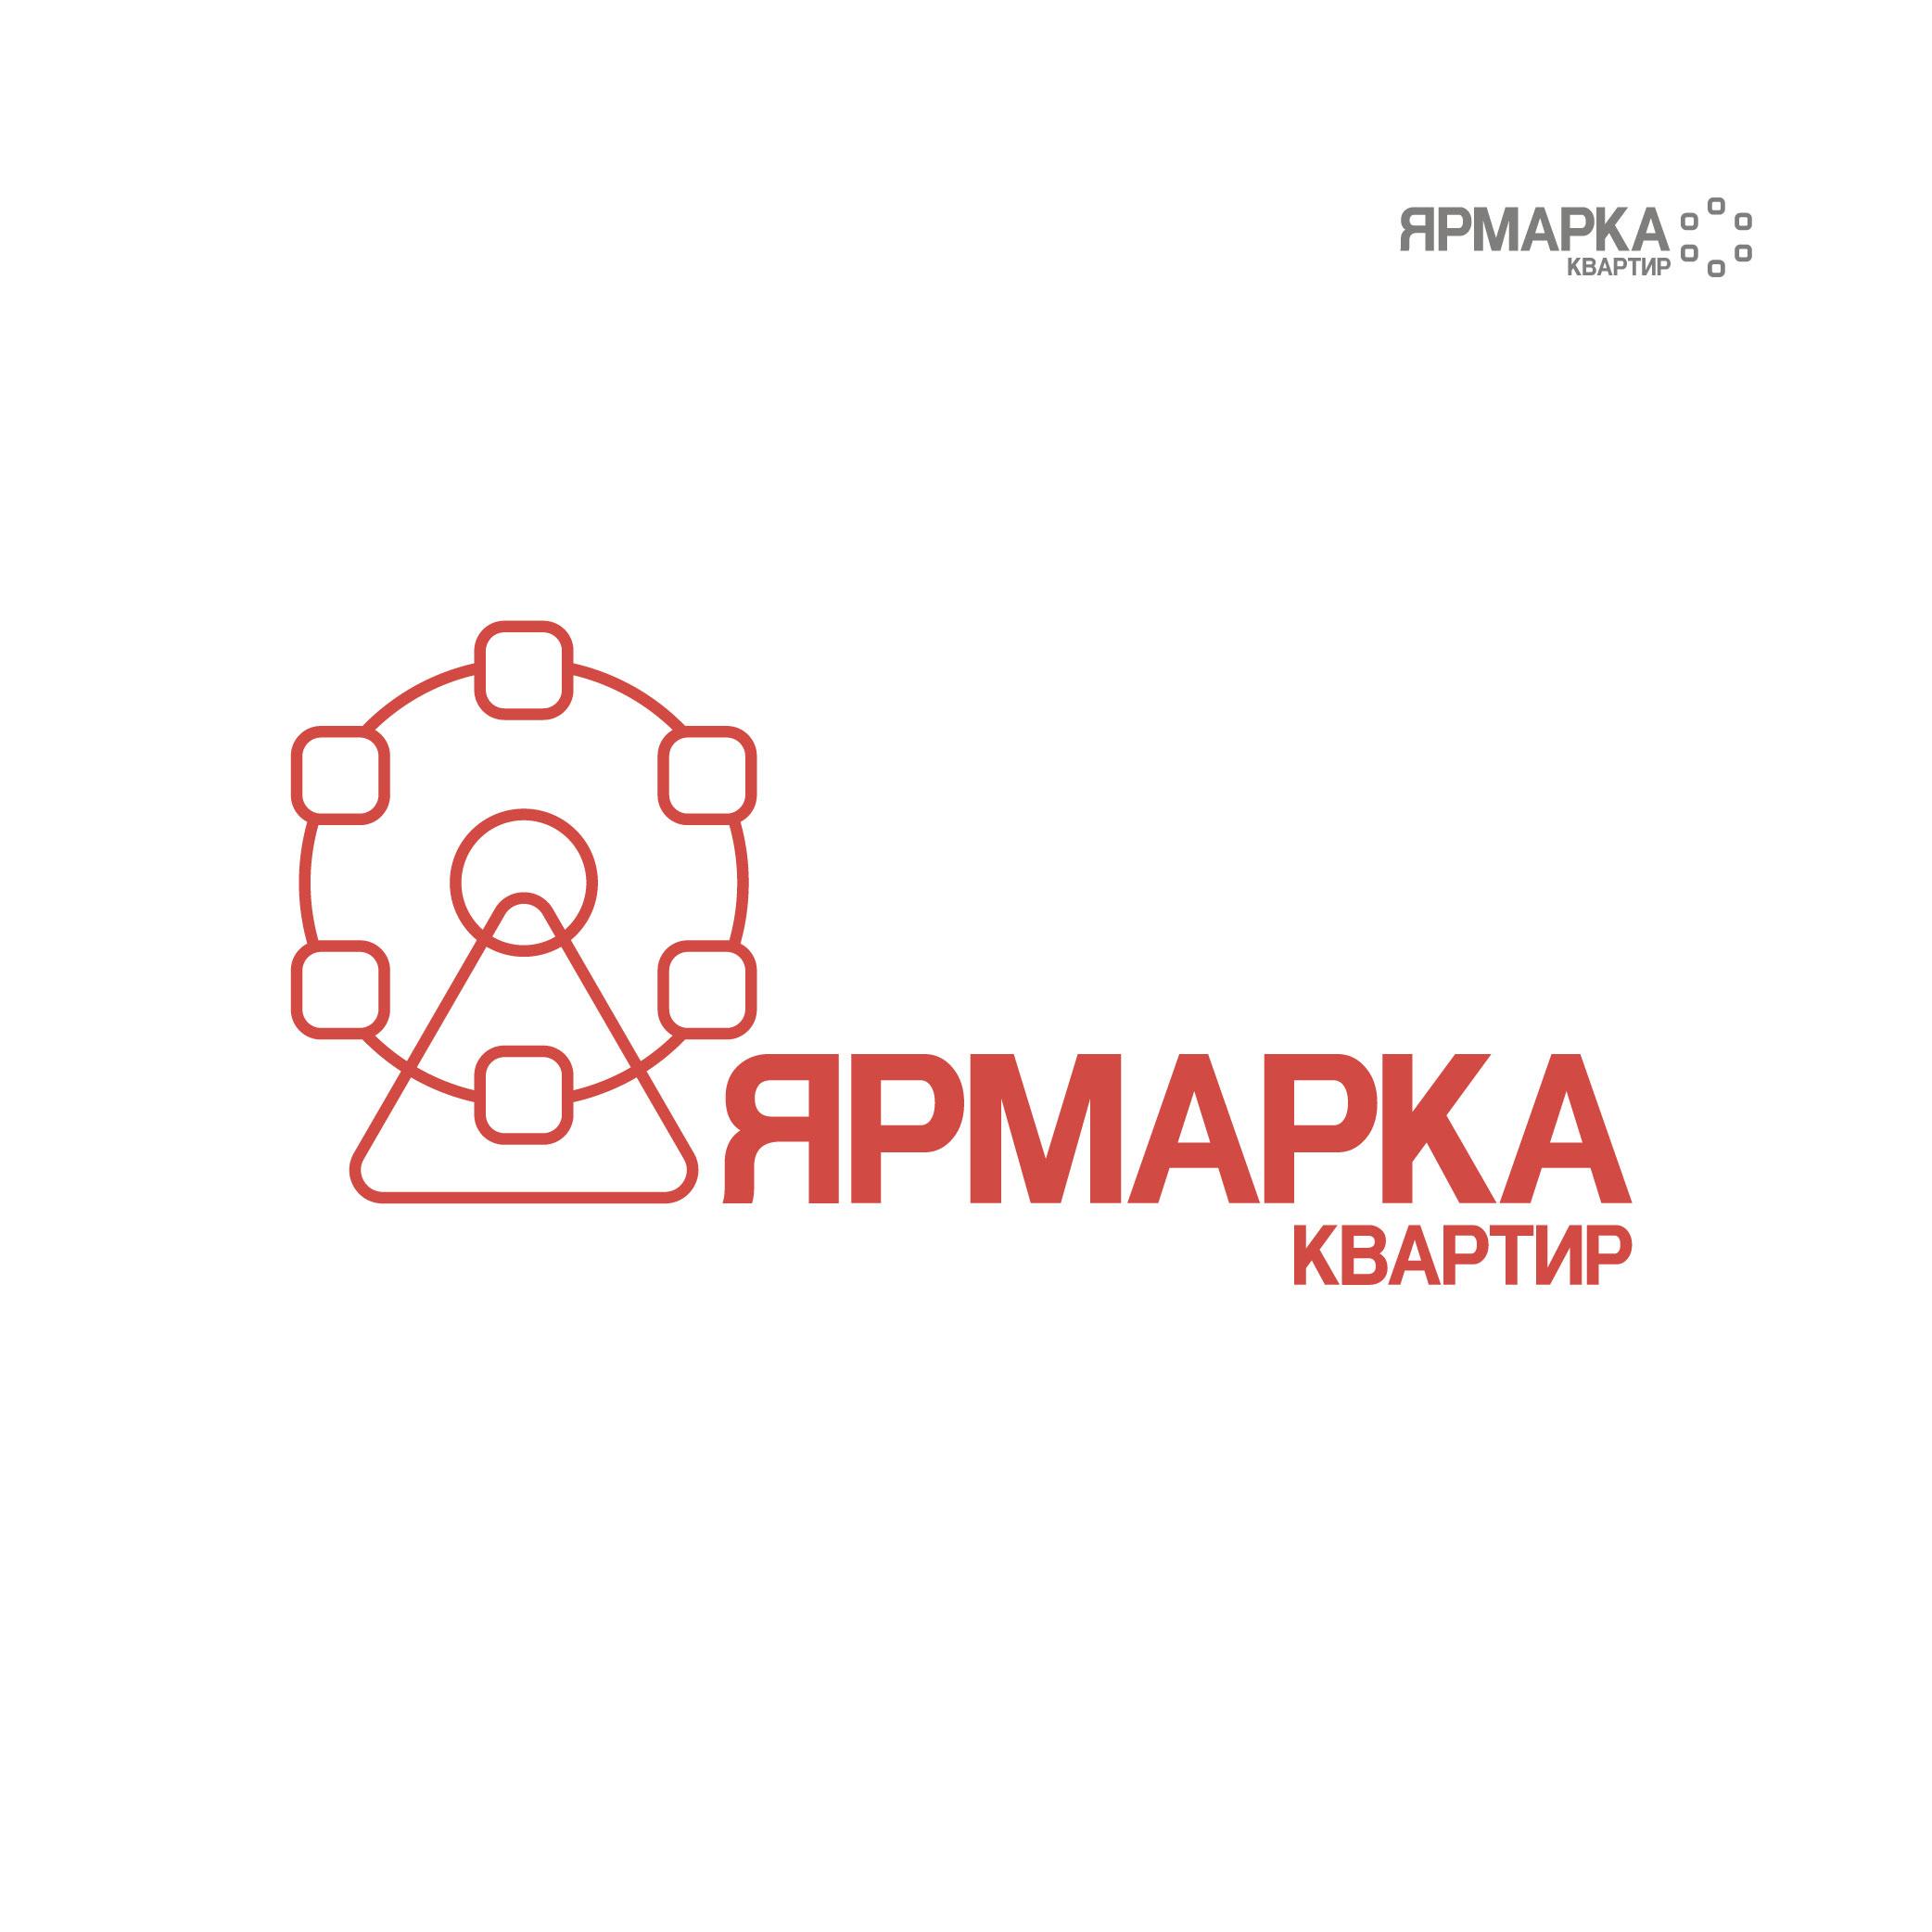 Создание логотипа, с вариантами для визитки и листовки фото f_56360042e4b29363.jpg